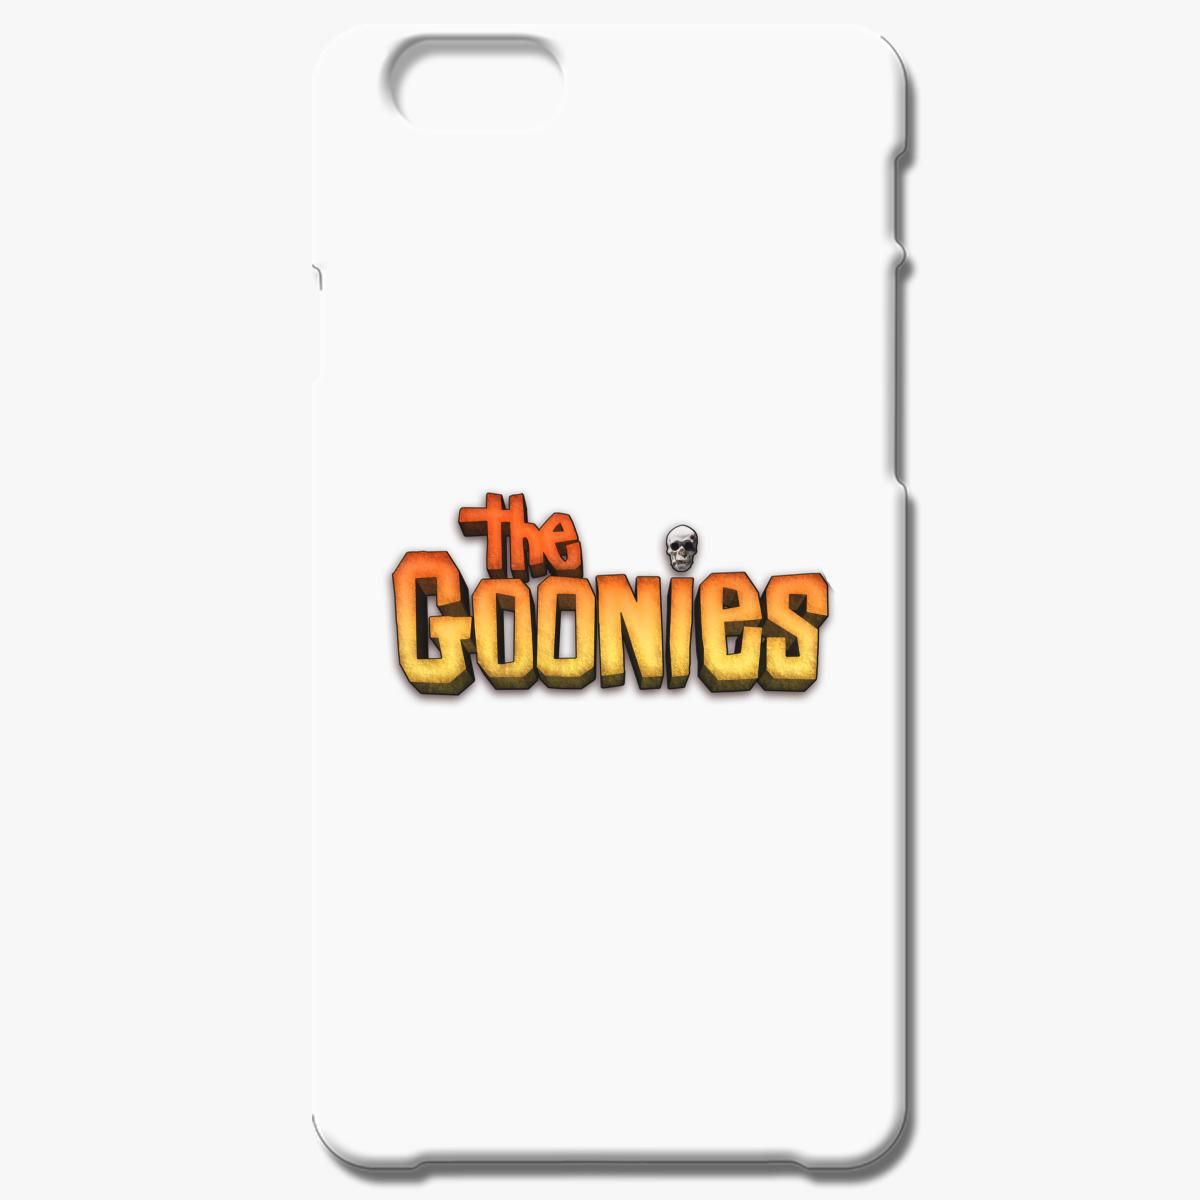 The Goonies Iphone 6 6s Case